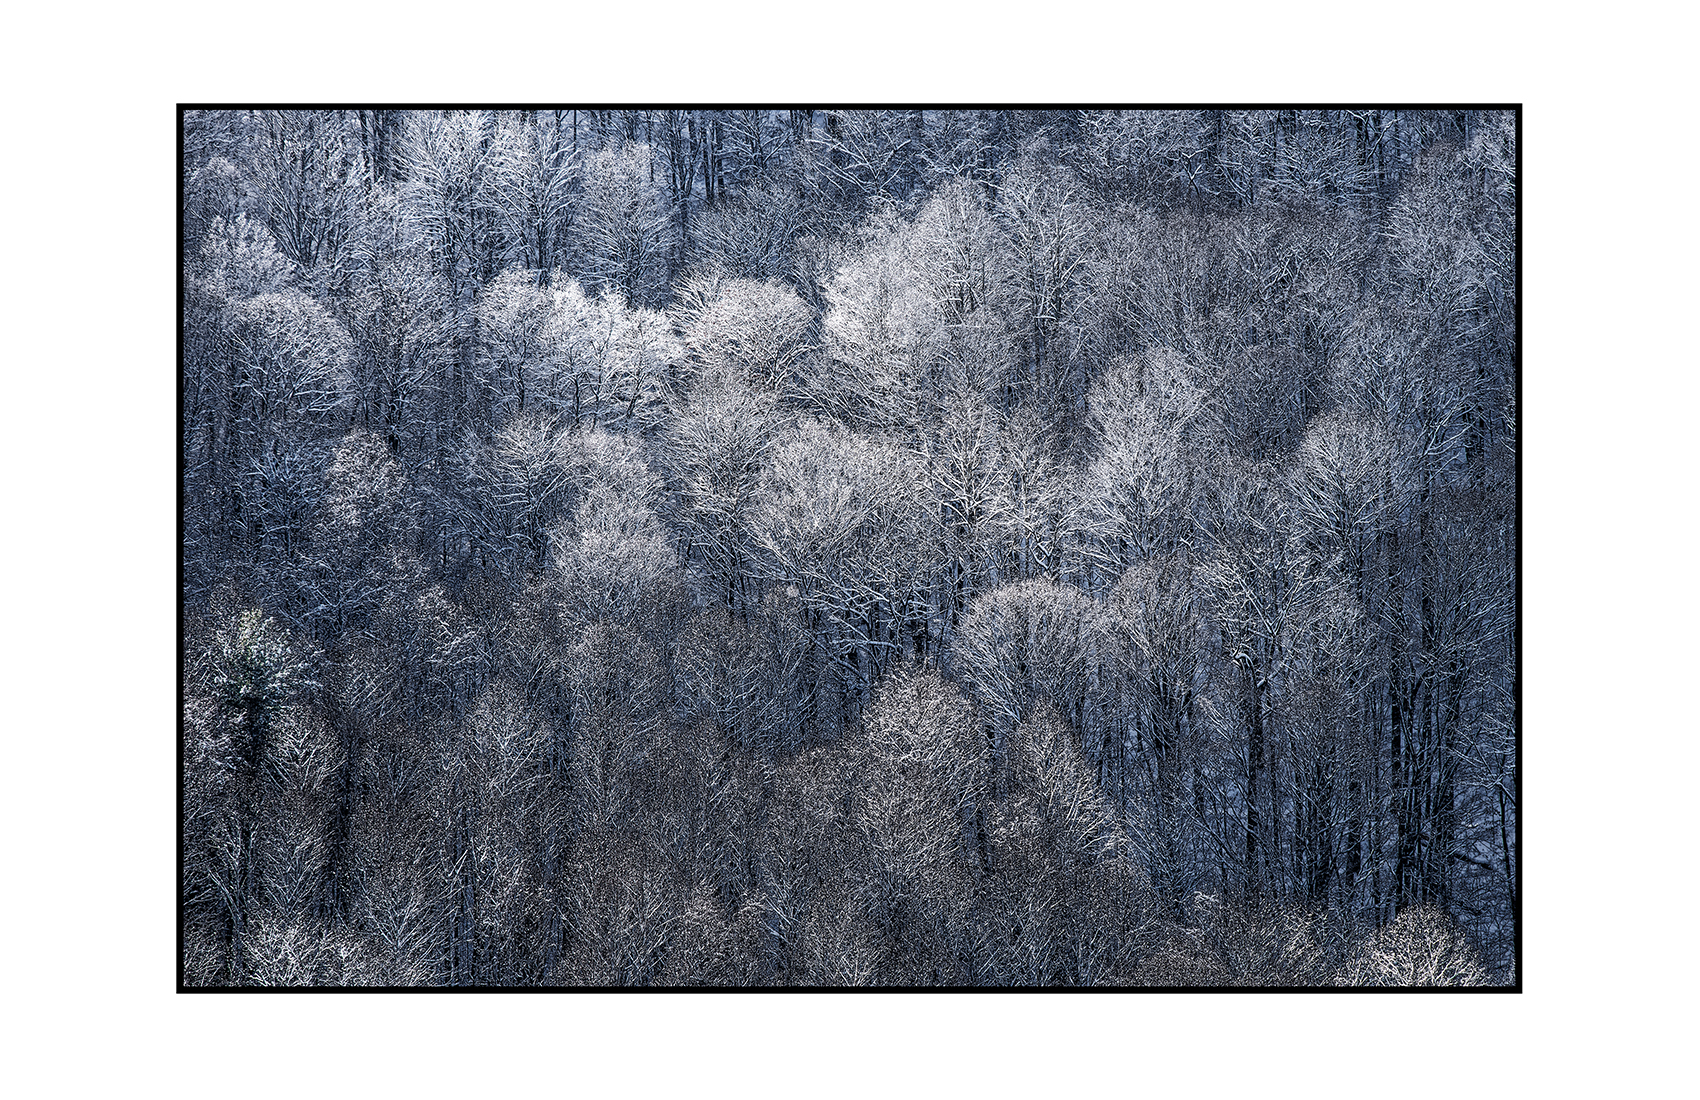 AppalachianForest28